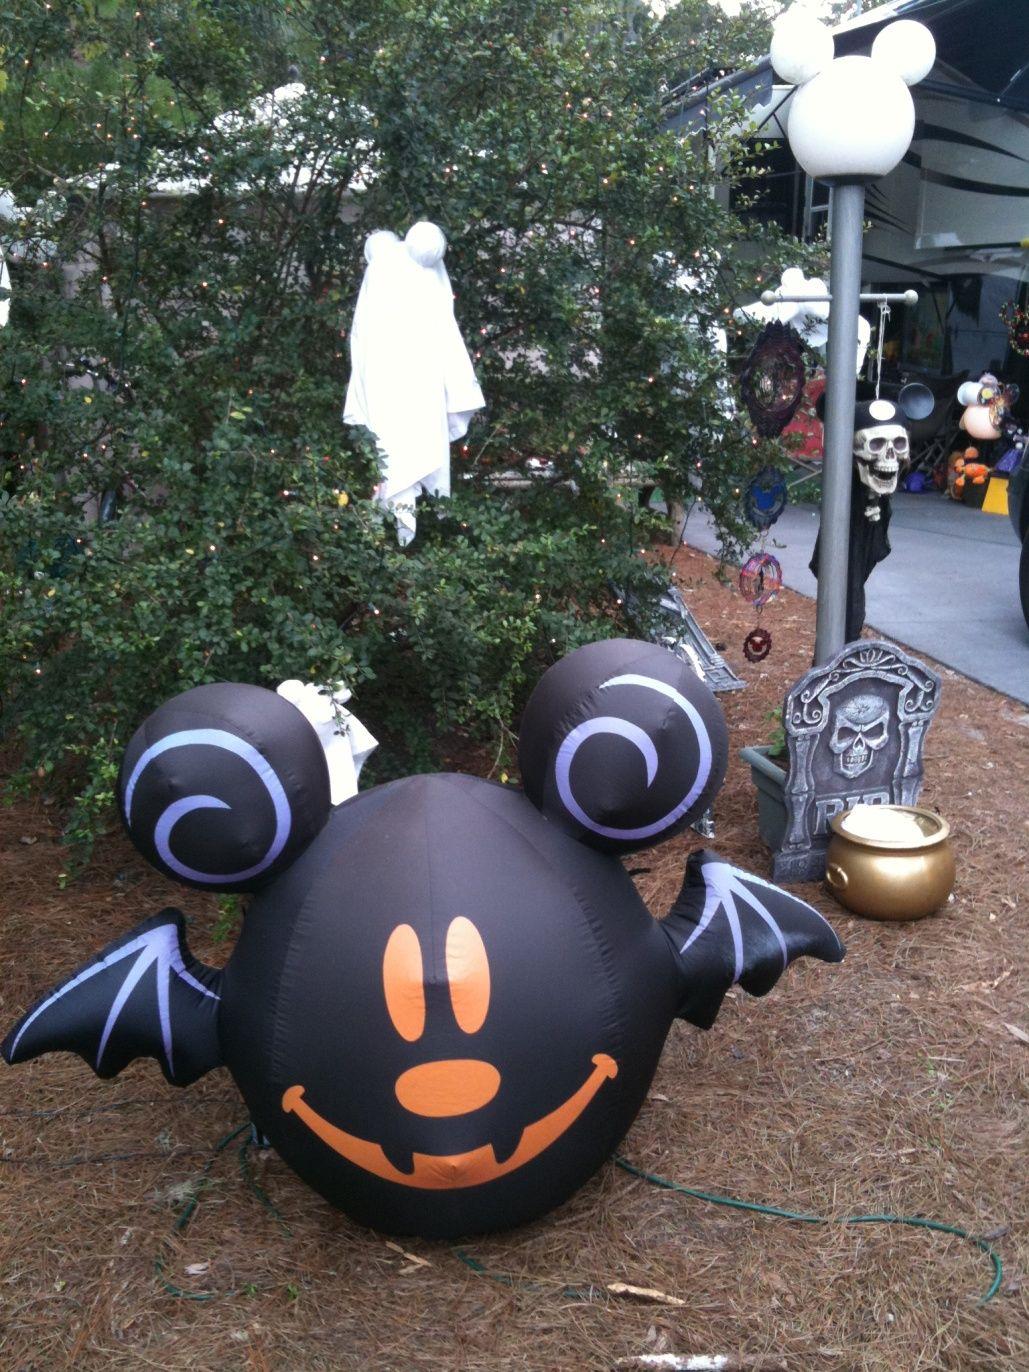 Complete List Of Halloween Decorations Ideas In Your Home Scary Halloween Decorations Outdoor Diy Fun Halloween Decor Halloween Party Decor Diy